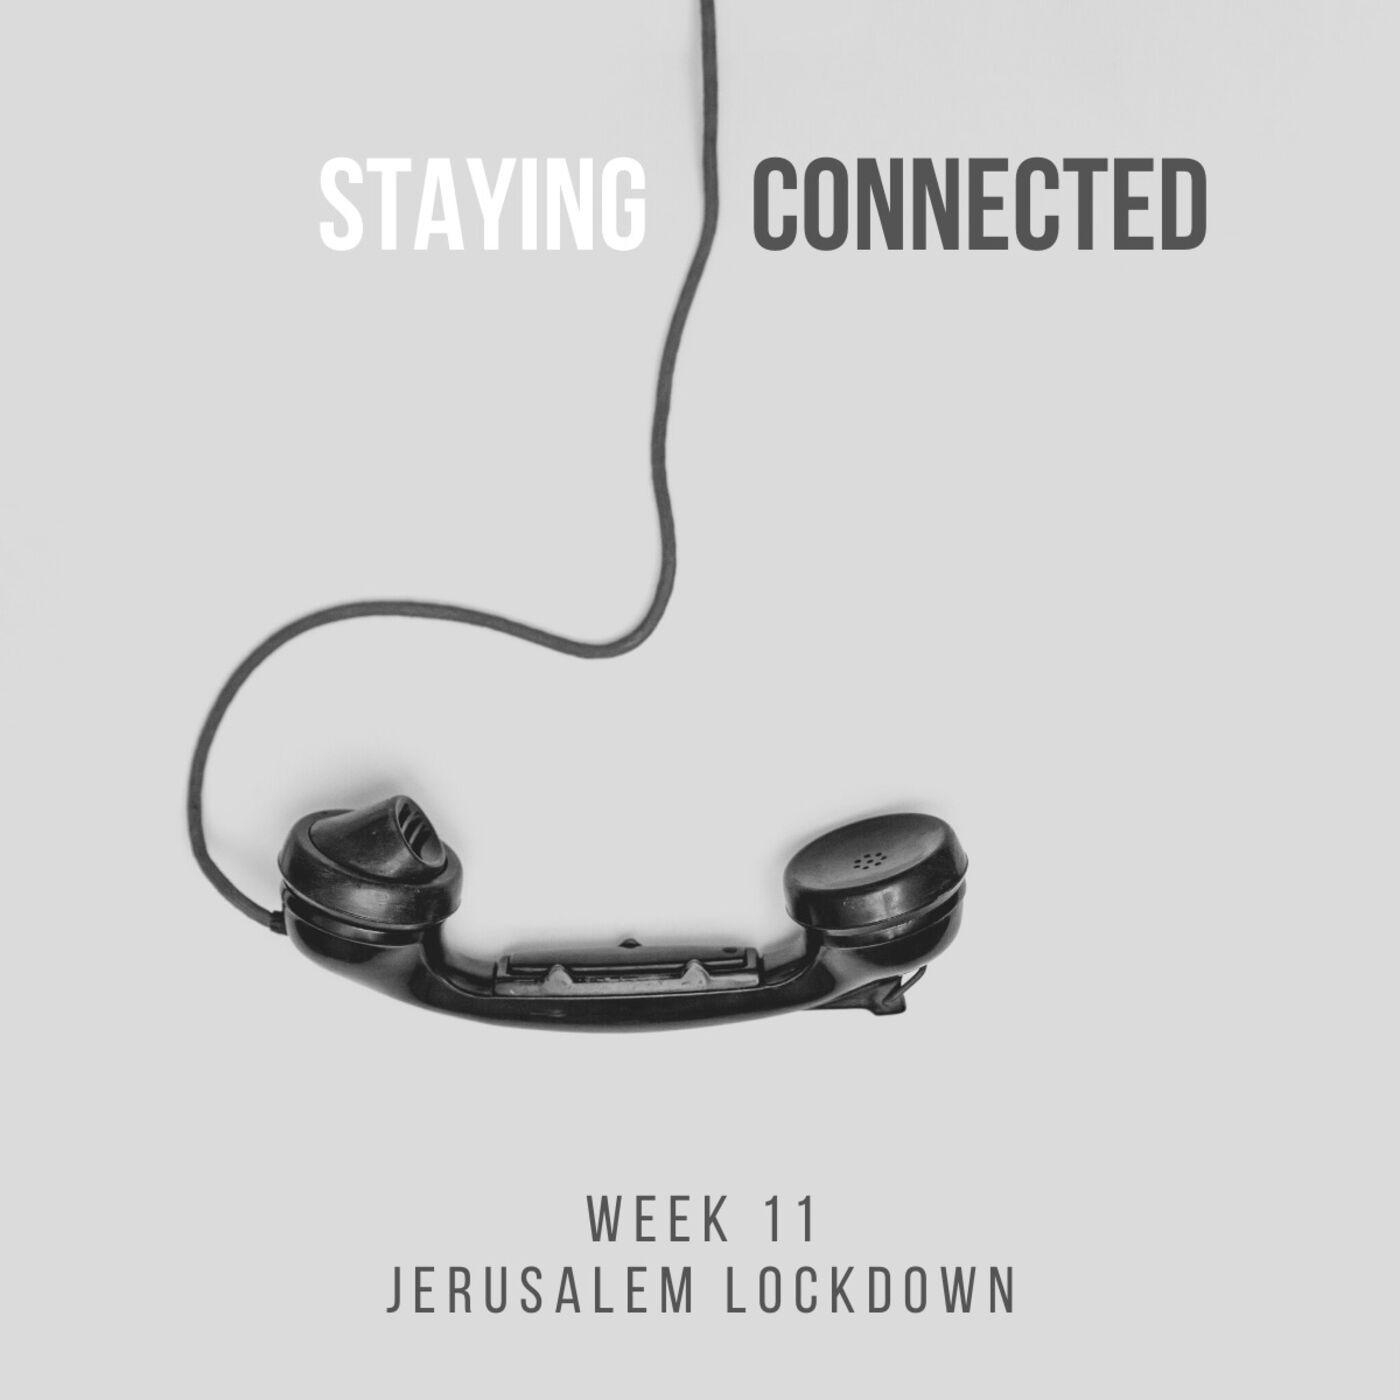 Week 11 - Staying Connected: Jerusalem Lockdown